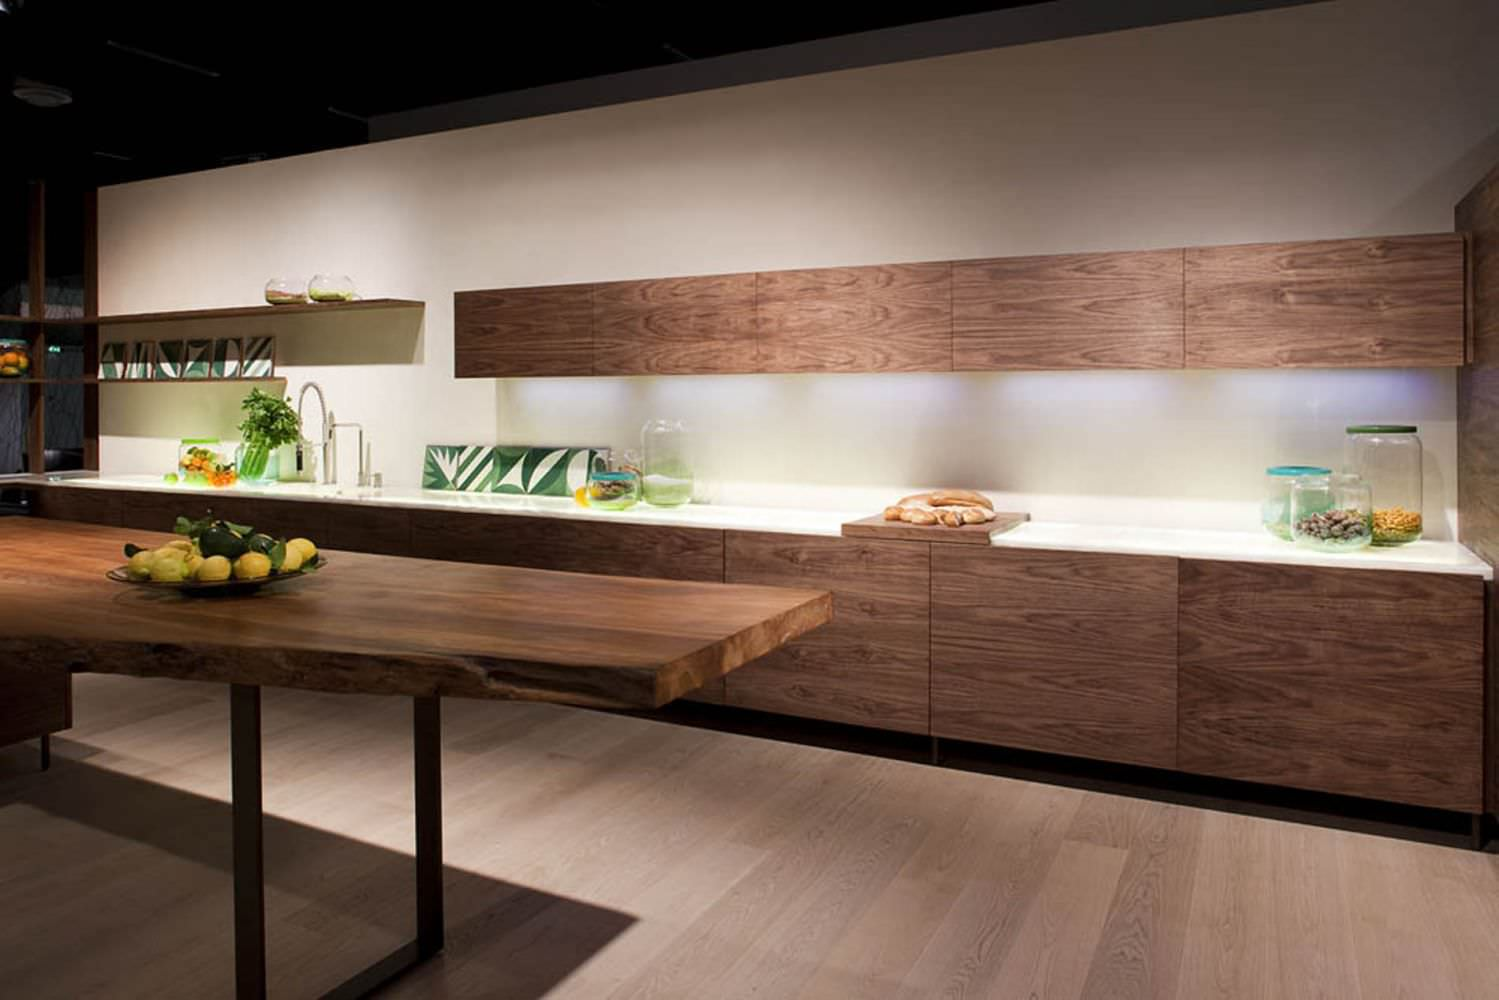 Cucina moderna / in legno / con isola - LA CUCINA by Matteo Thun ...